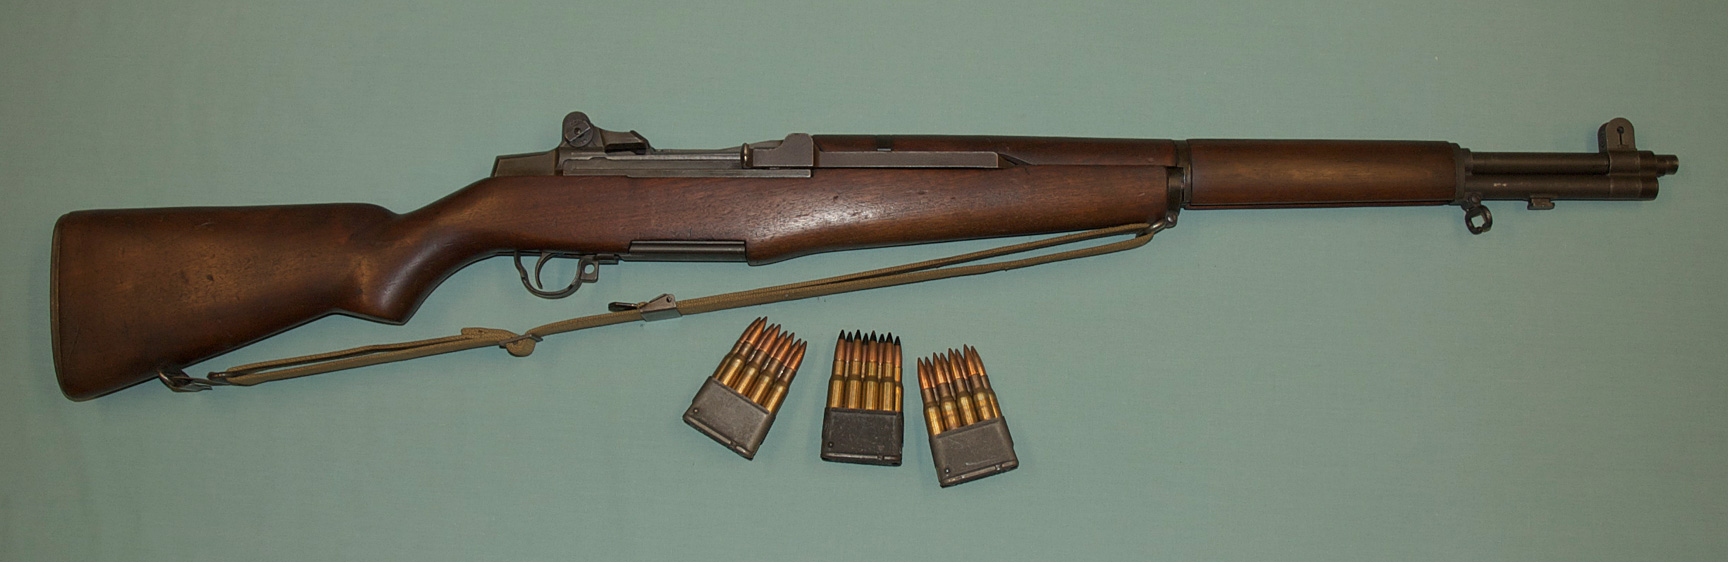 M Garand Rifle on M1 30 Carbine Stocks